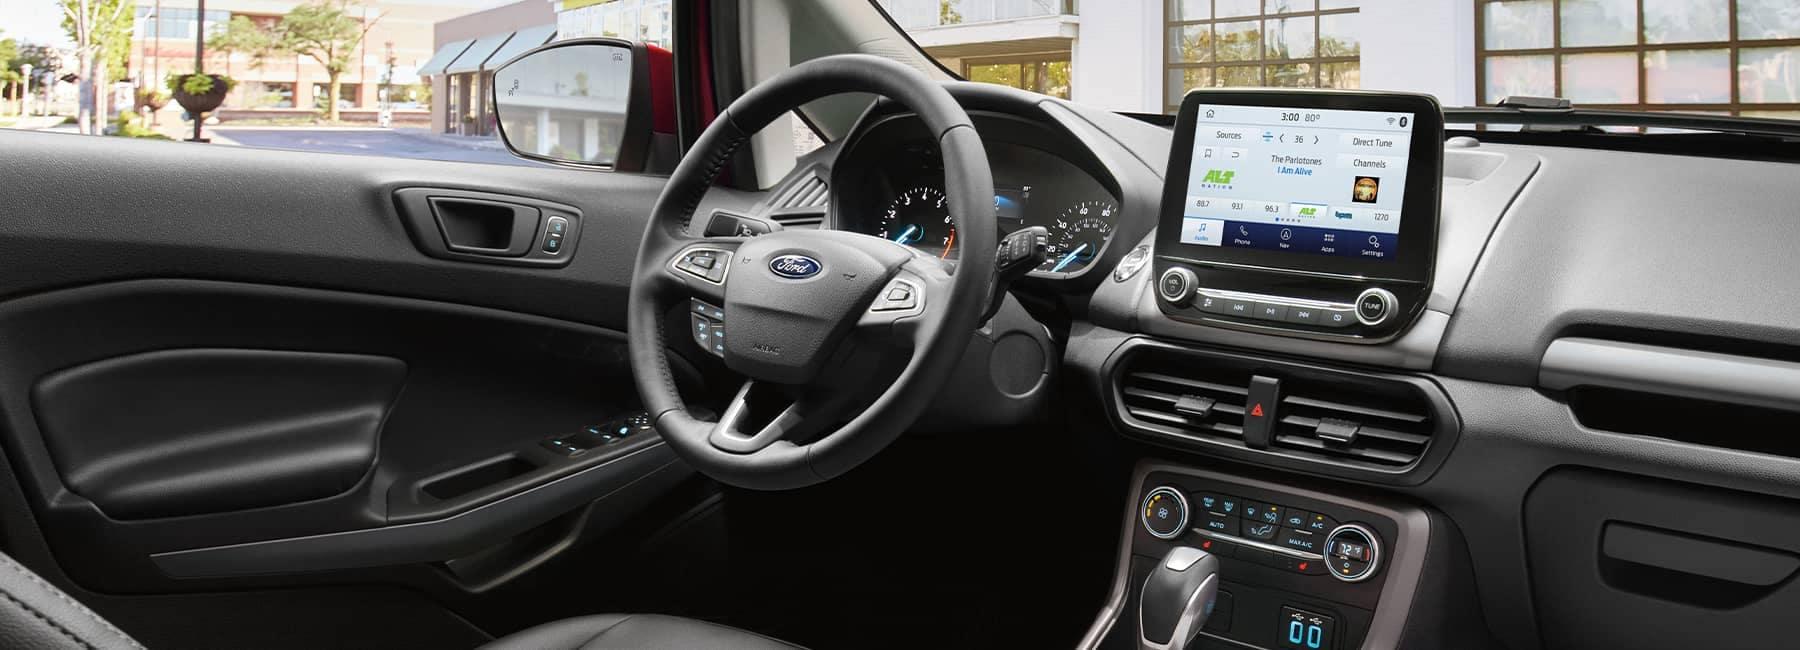 https://di-uploads-development.dealerinspire.com/grooveford/uploads/2021/09/2021-Ford-EcoSport-interior-dashboard.jpg